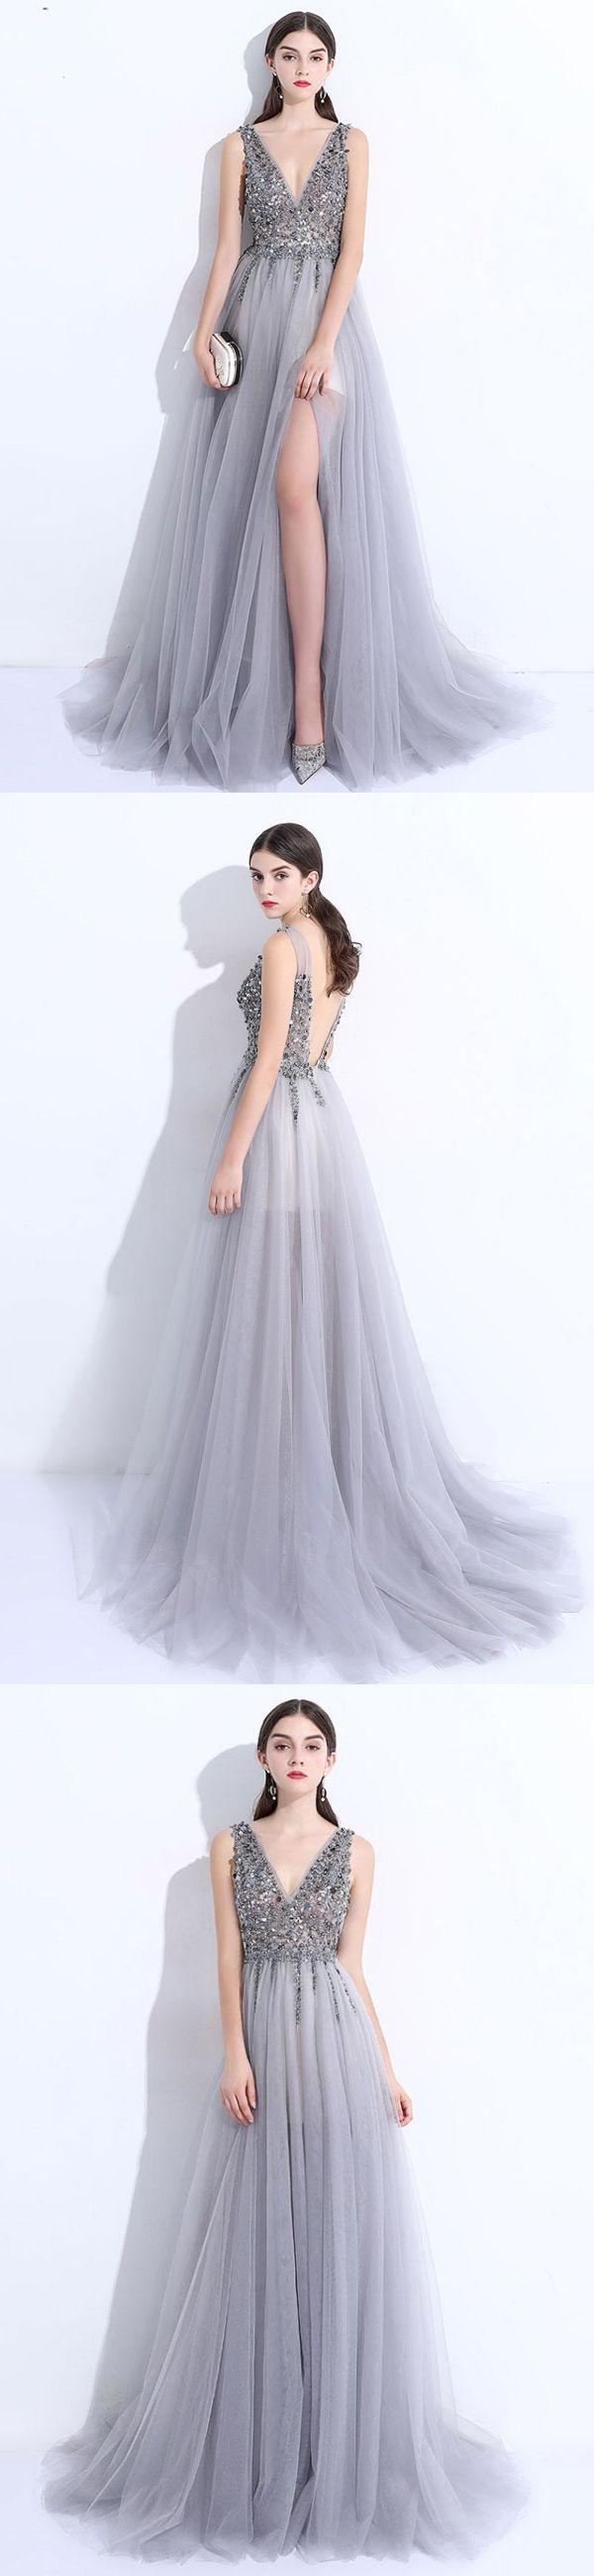 2018 Long Prom Dress A Line Custom Made Unique Cheap Silver Prom Dress Vb964 Backless Prom Dresses Silver Prom Dress Prom Dresses [ 2600 x 600 Pixel ]